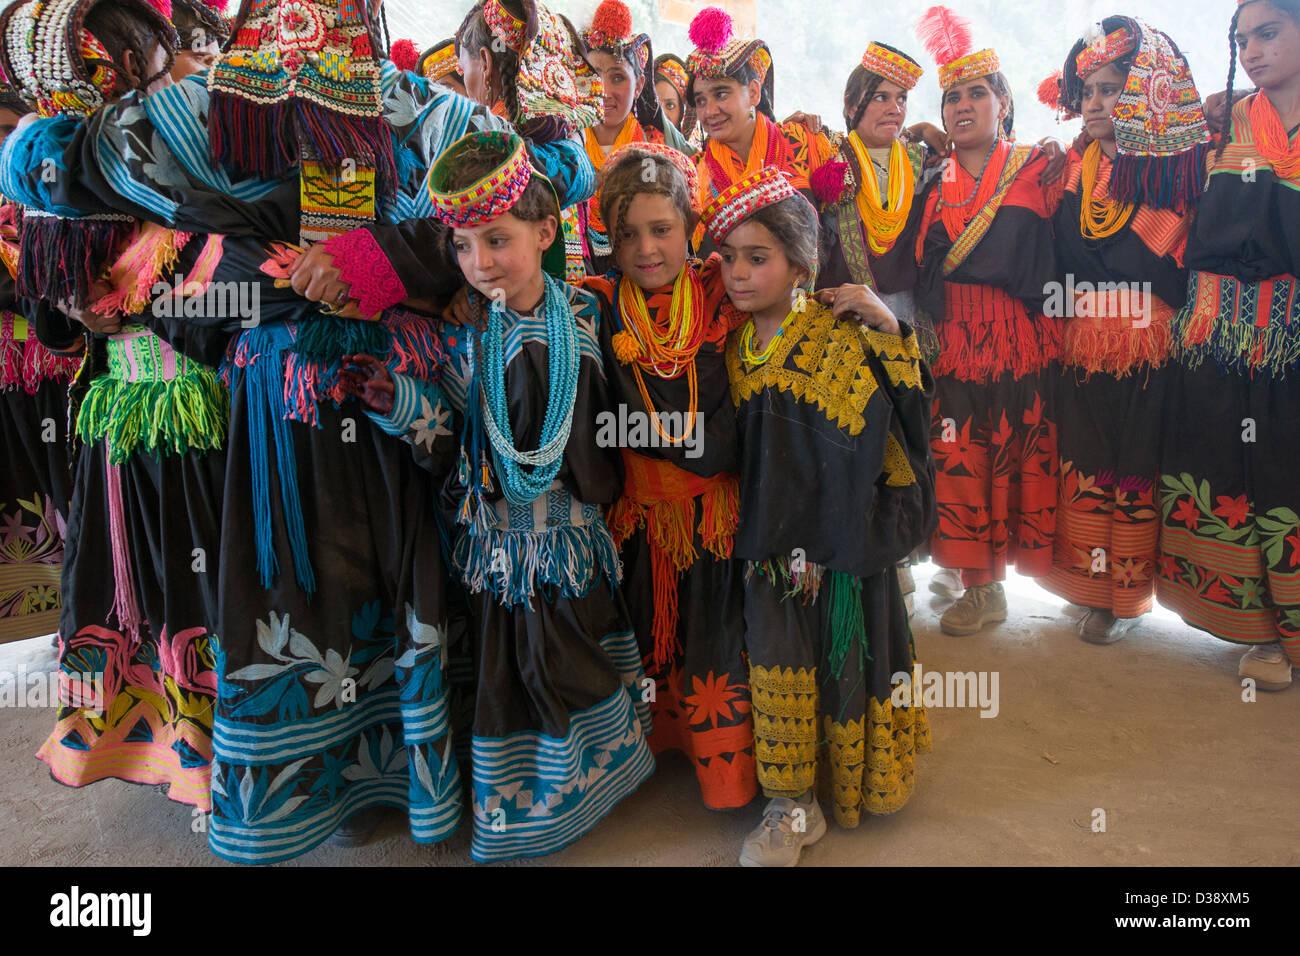 Young Kalash girls dancing in a cirlce of older women at the Kalash Joshi (Spring Festival), Grum Village Charso - Stock Image